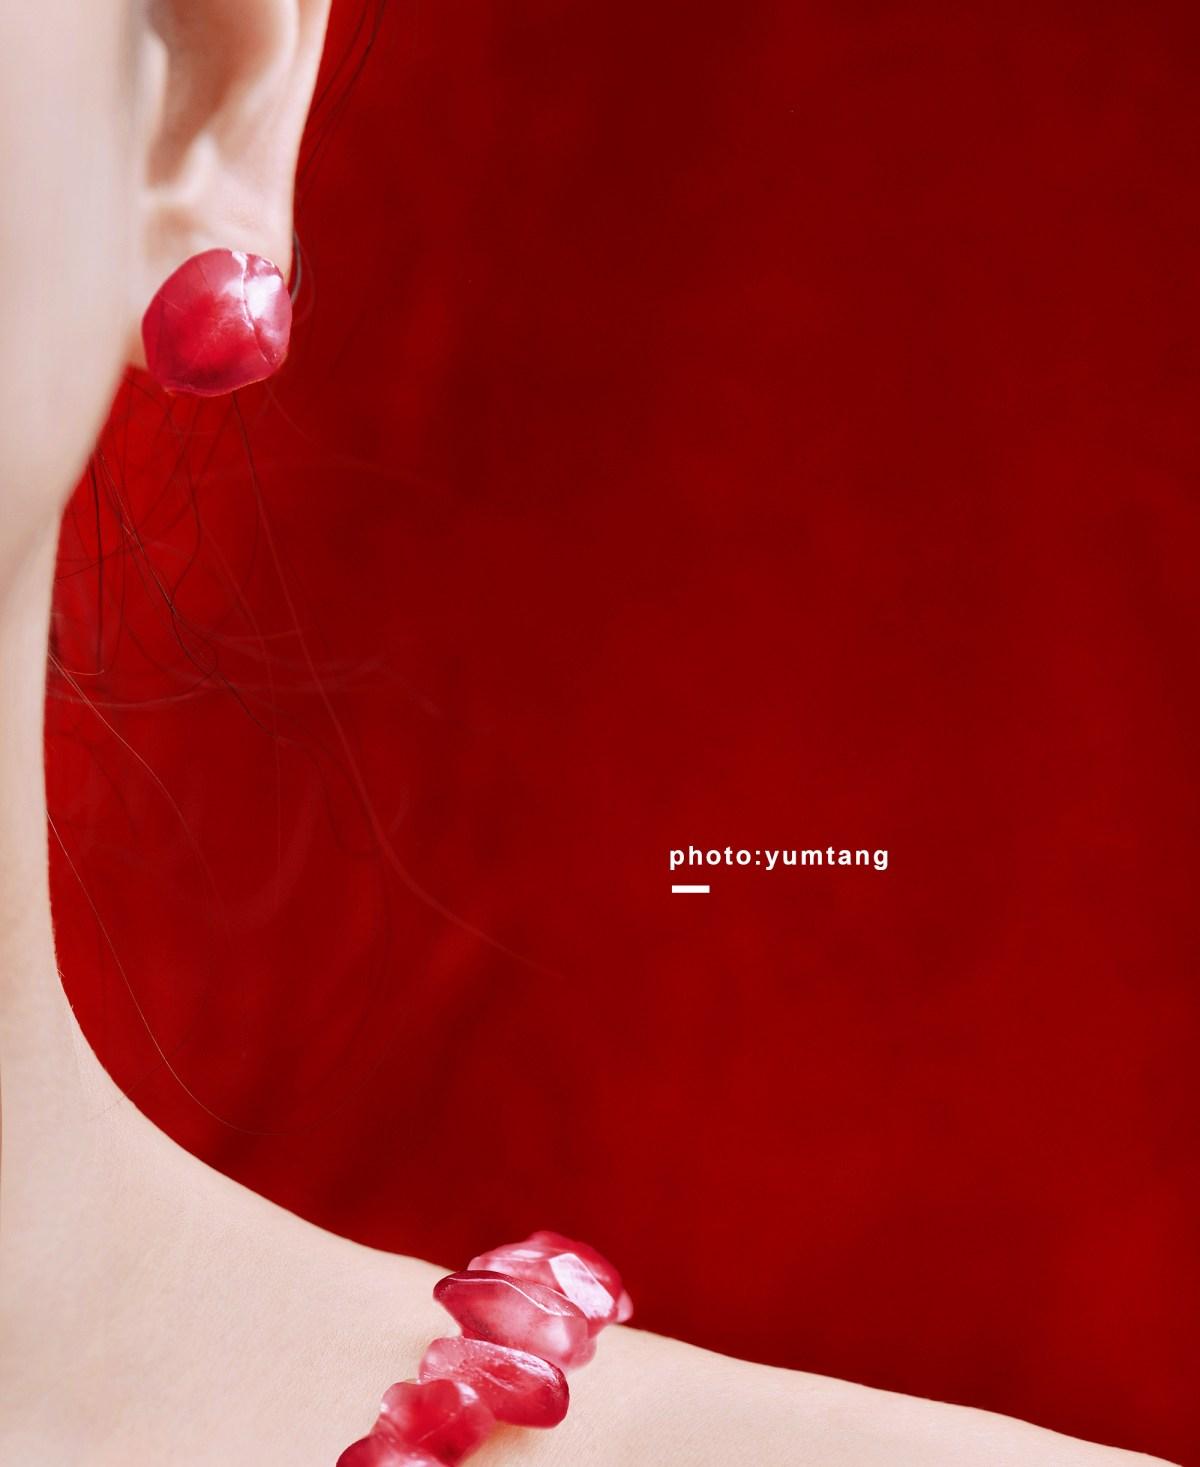 pomegranate-moss-and-fog-4